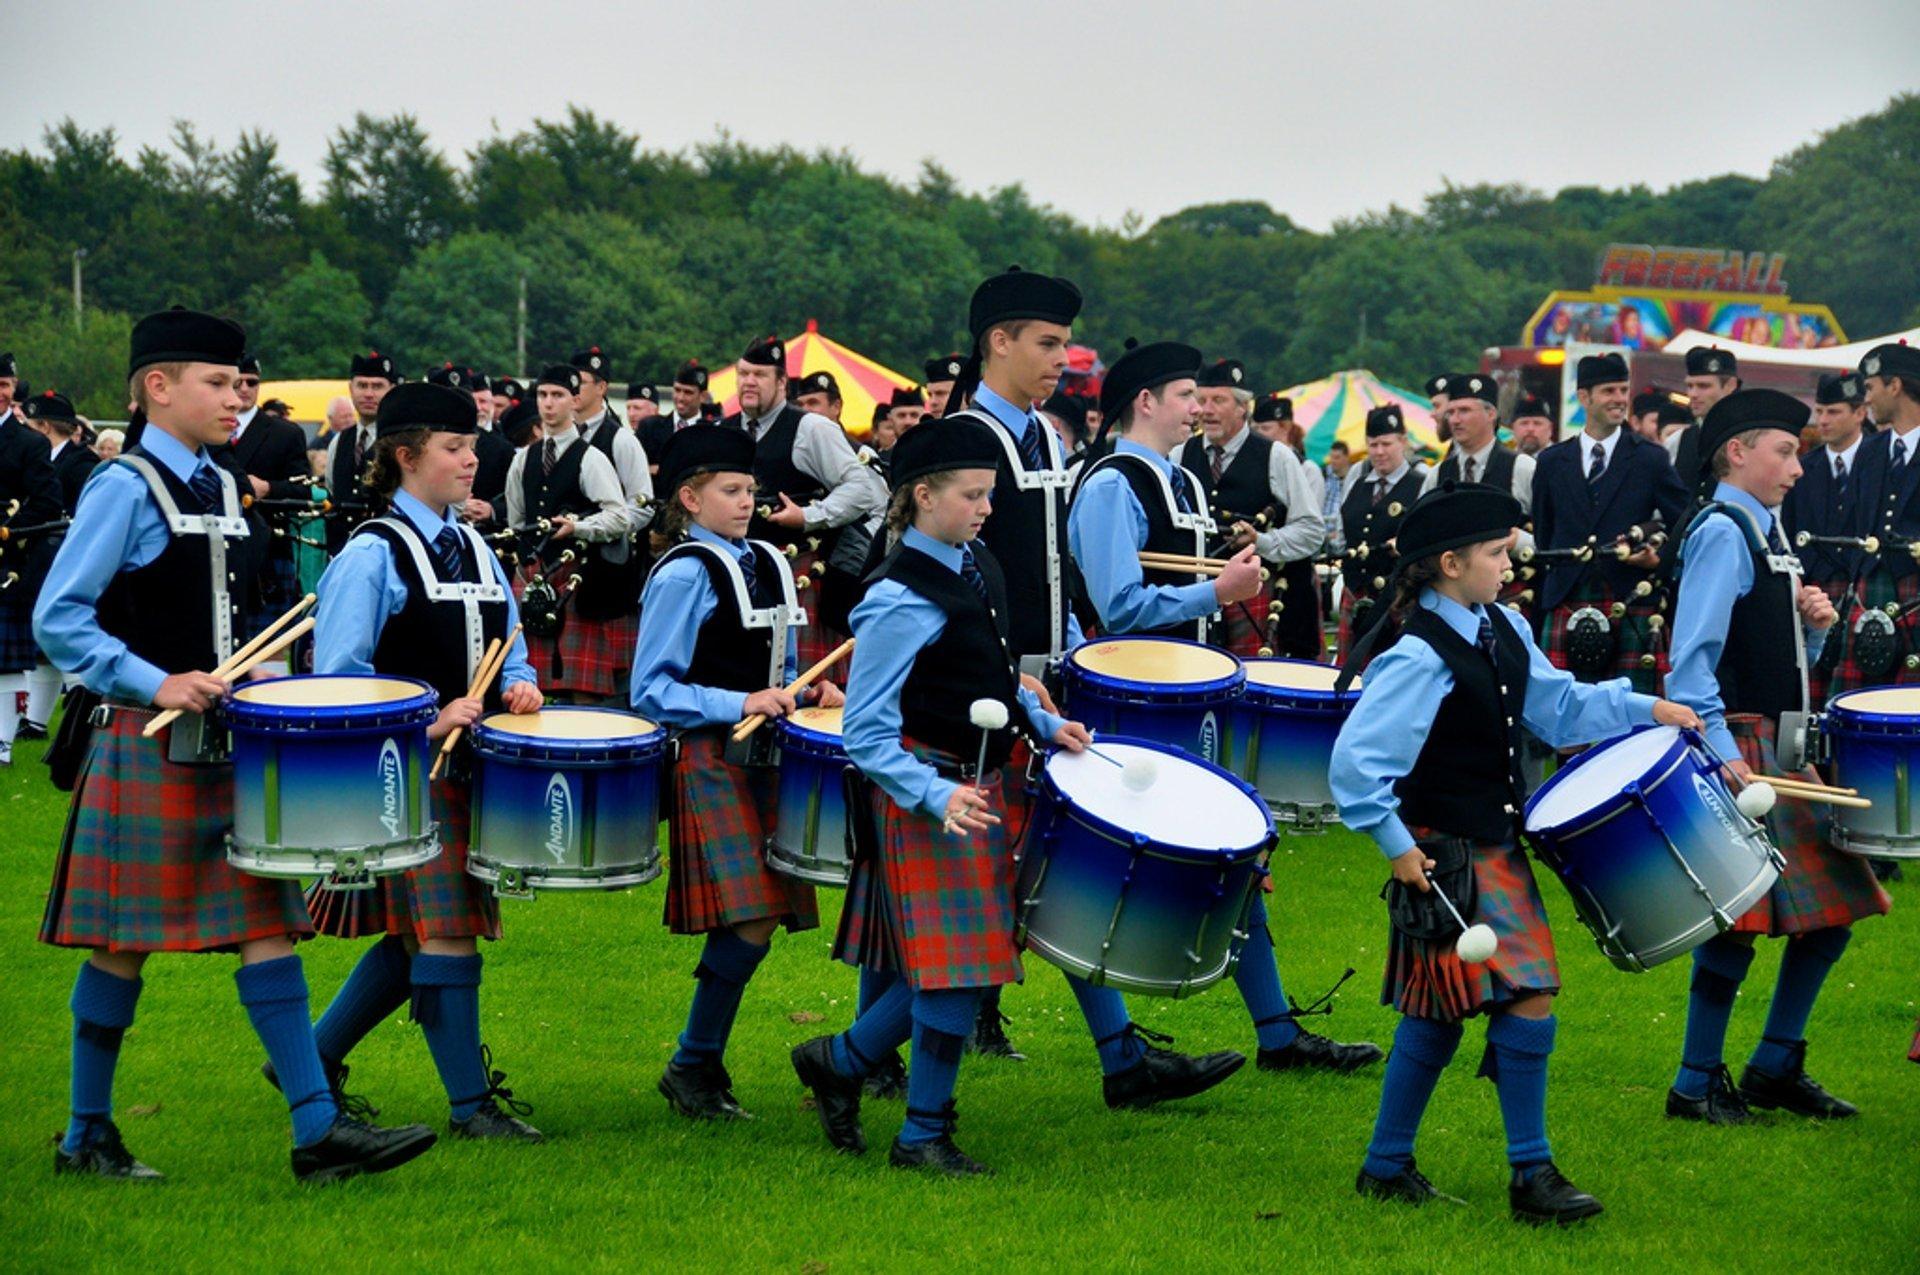 North Berwick International Highland Games in Edinburgh 2019 - Best Time